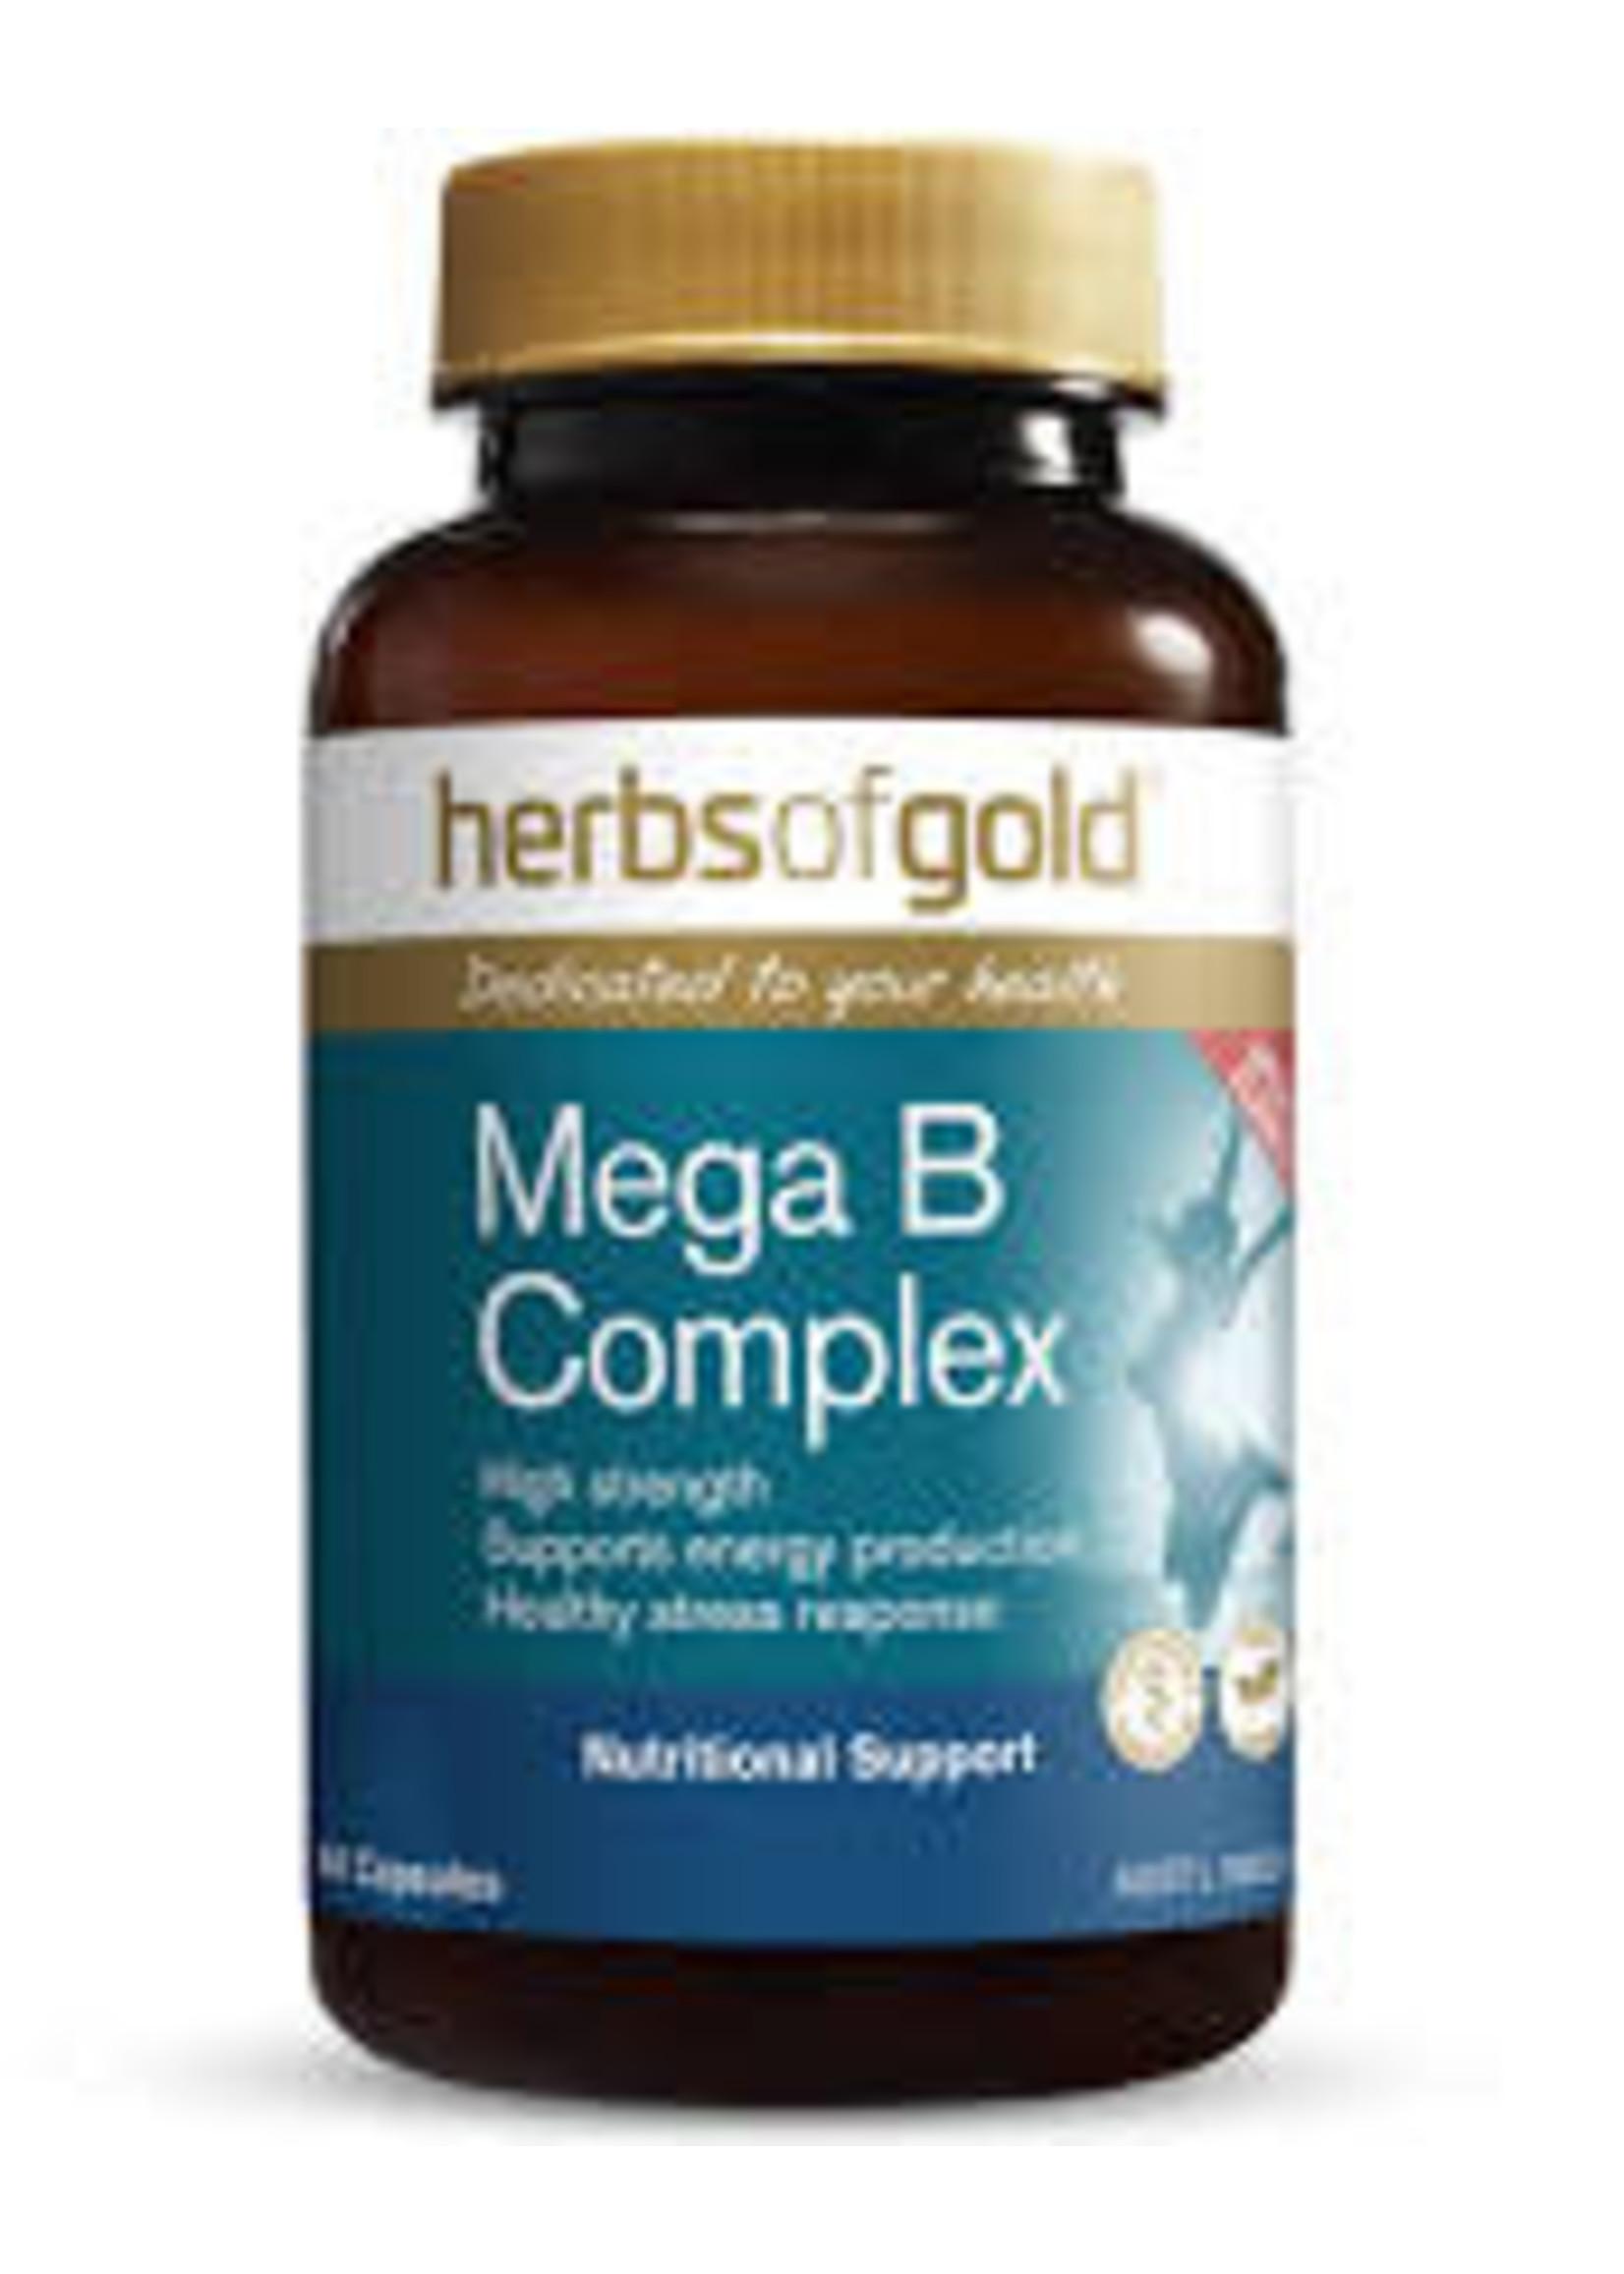 Herbs of Gold Herbs of Gold Mega B Complex 60 caps